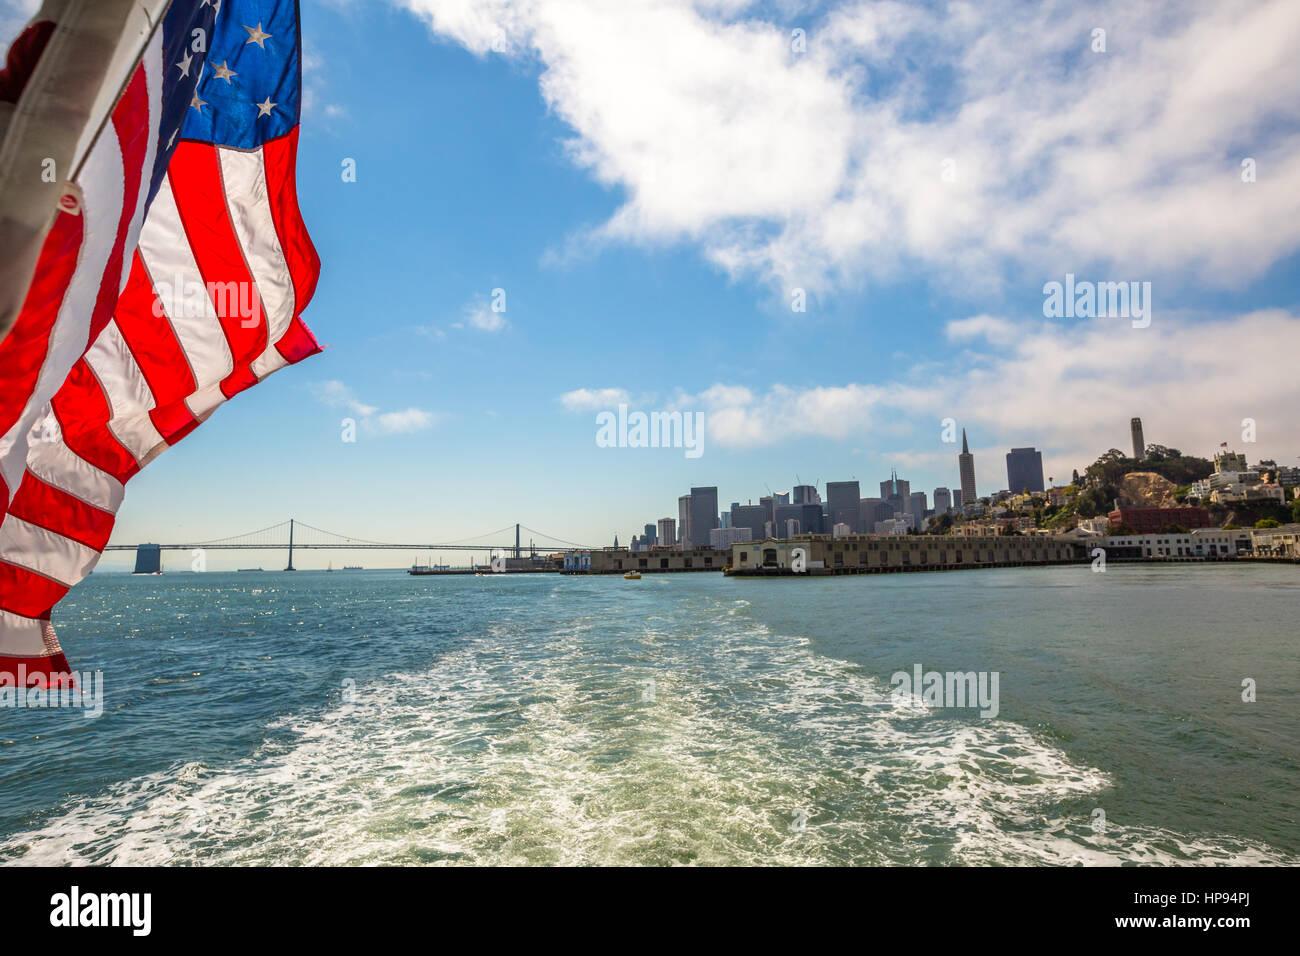 San Francisco Financial District cityscape and Oakland Bridge on sunny day, California, United States. Sea views - Stock Image